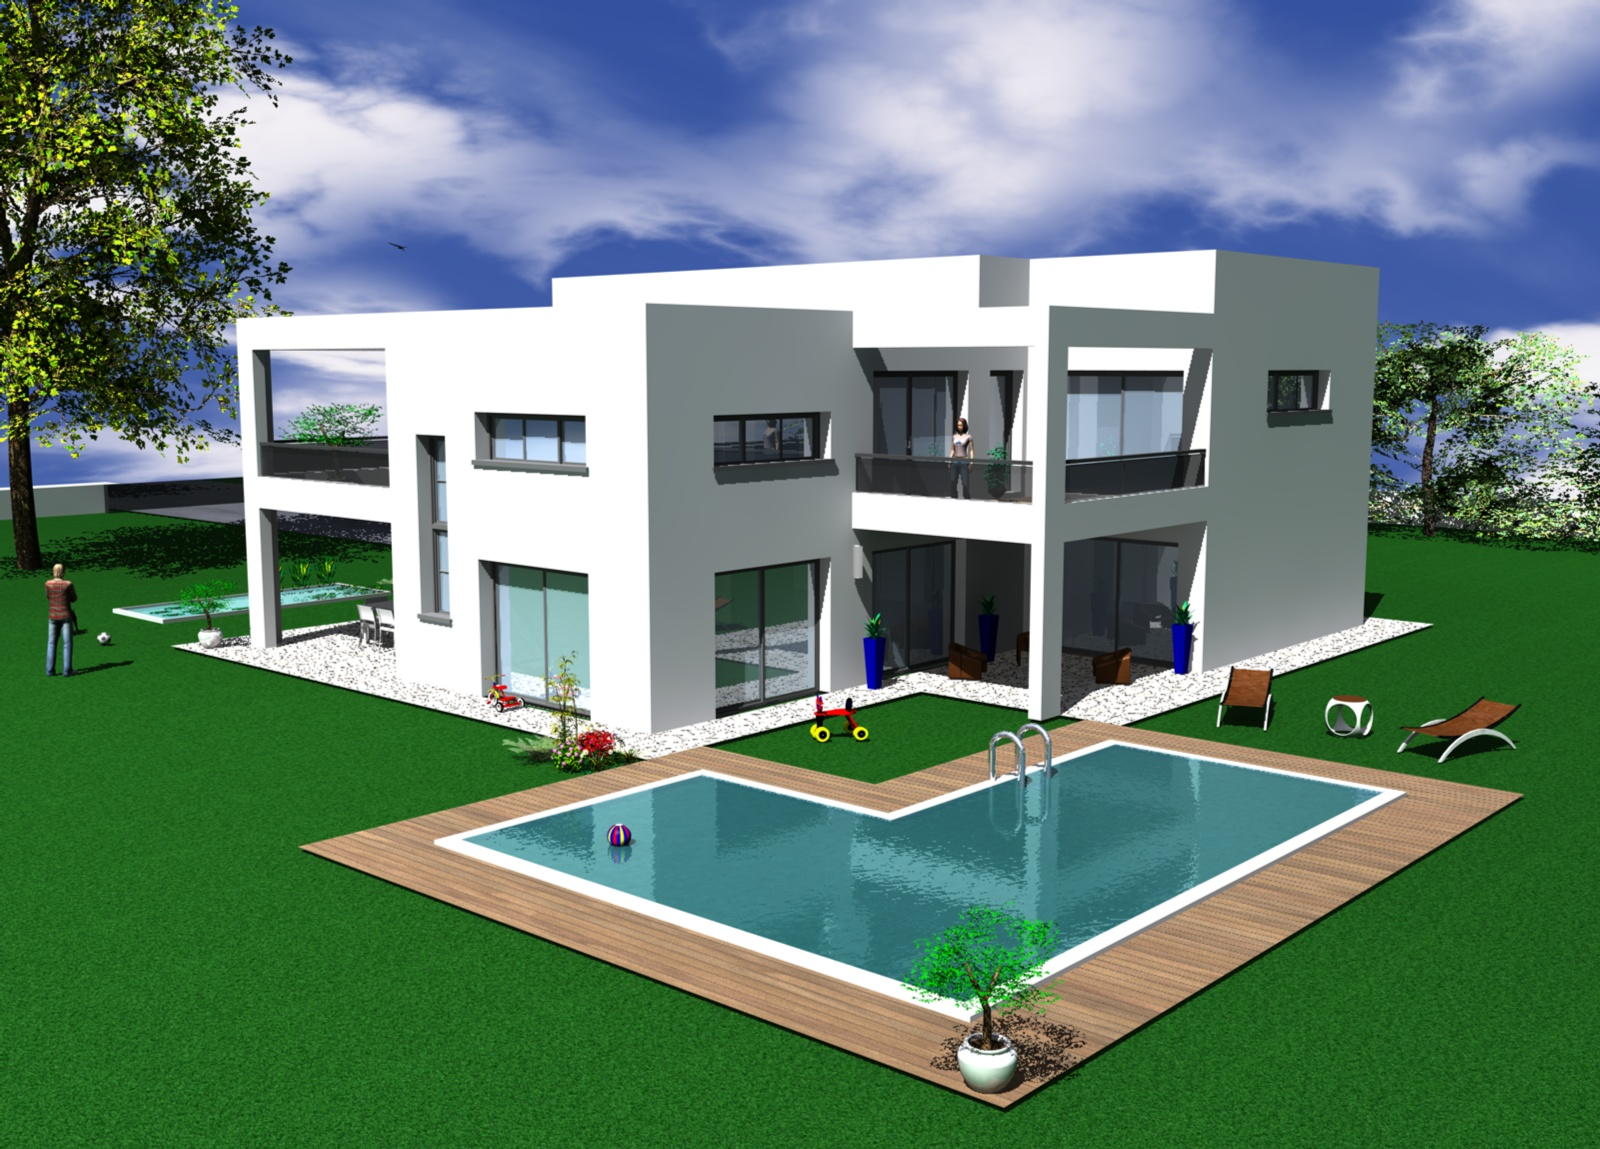 Image Maison Design